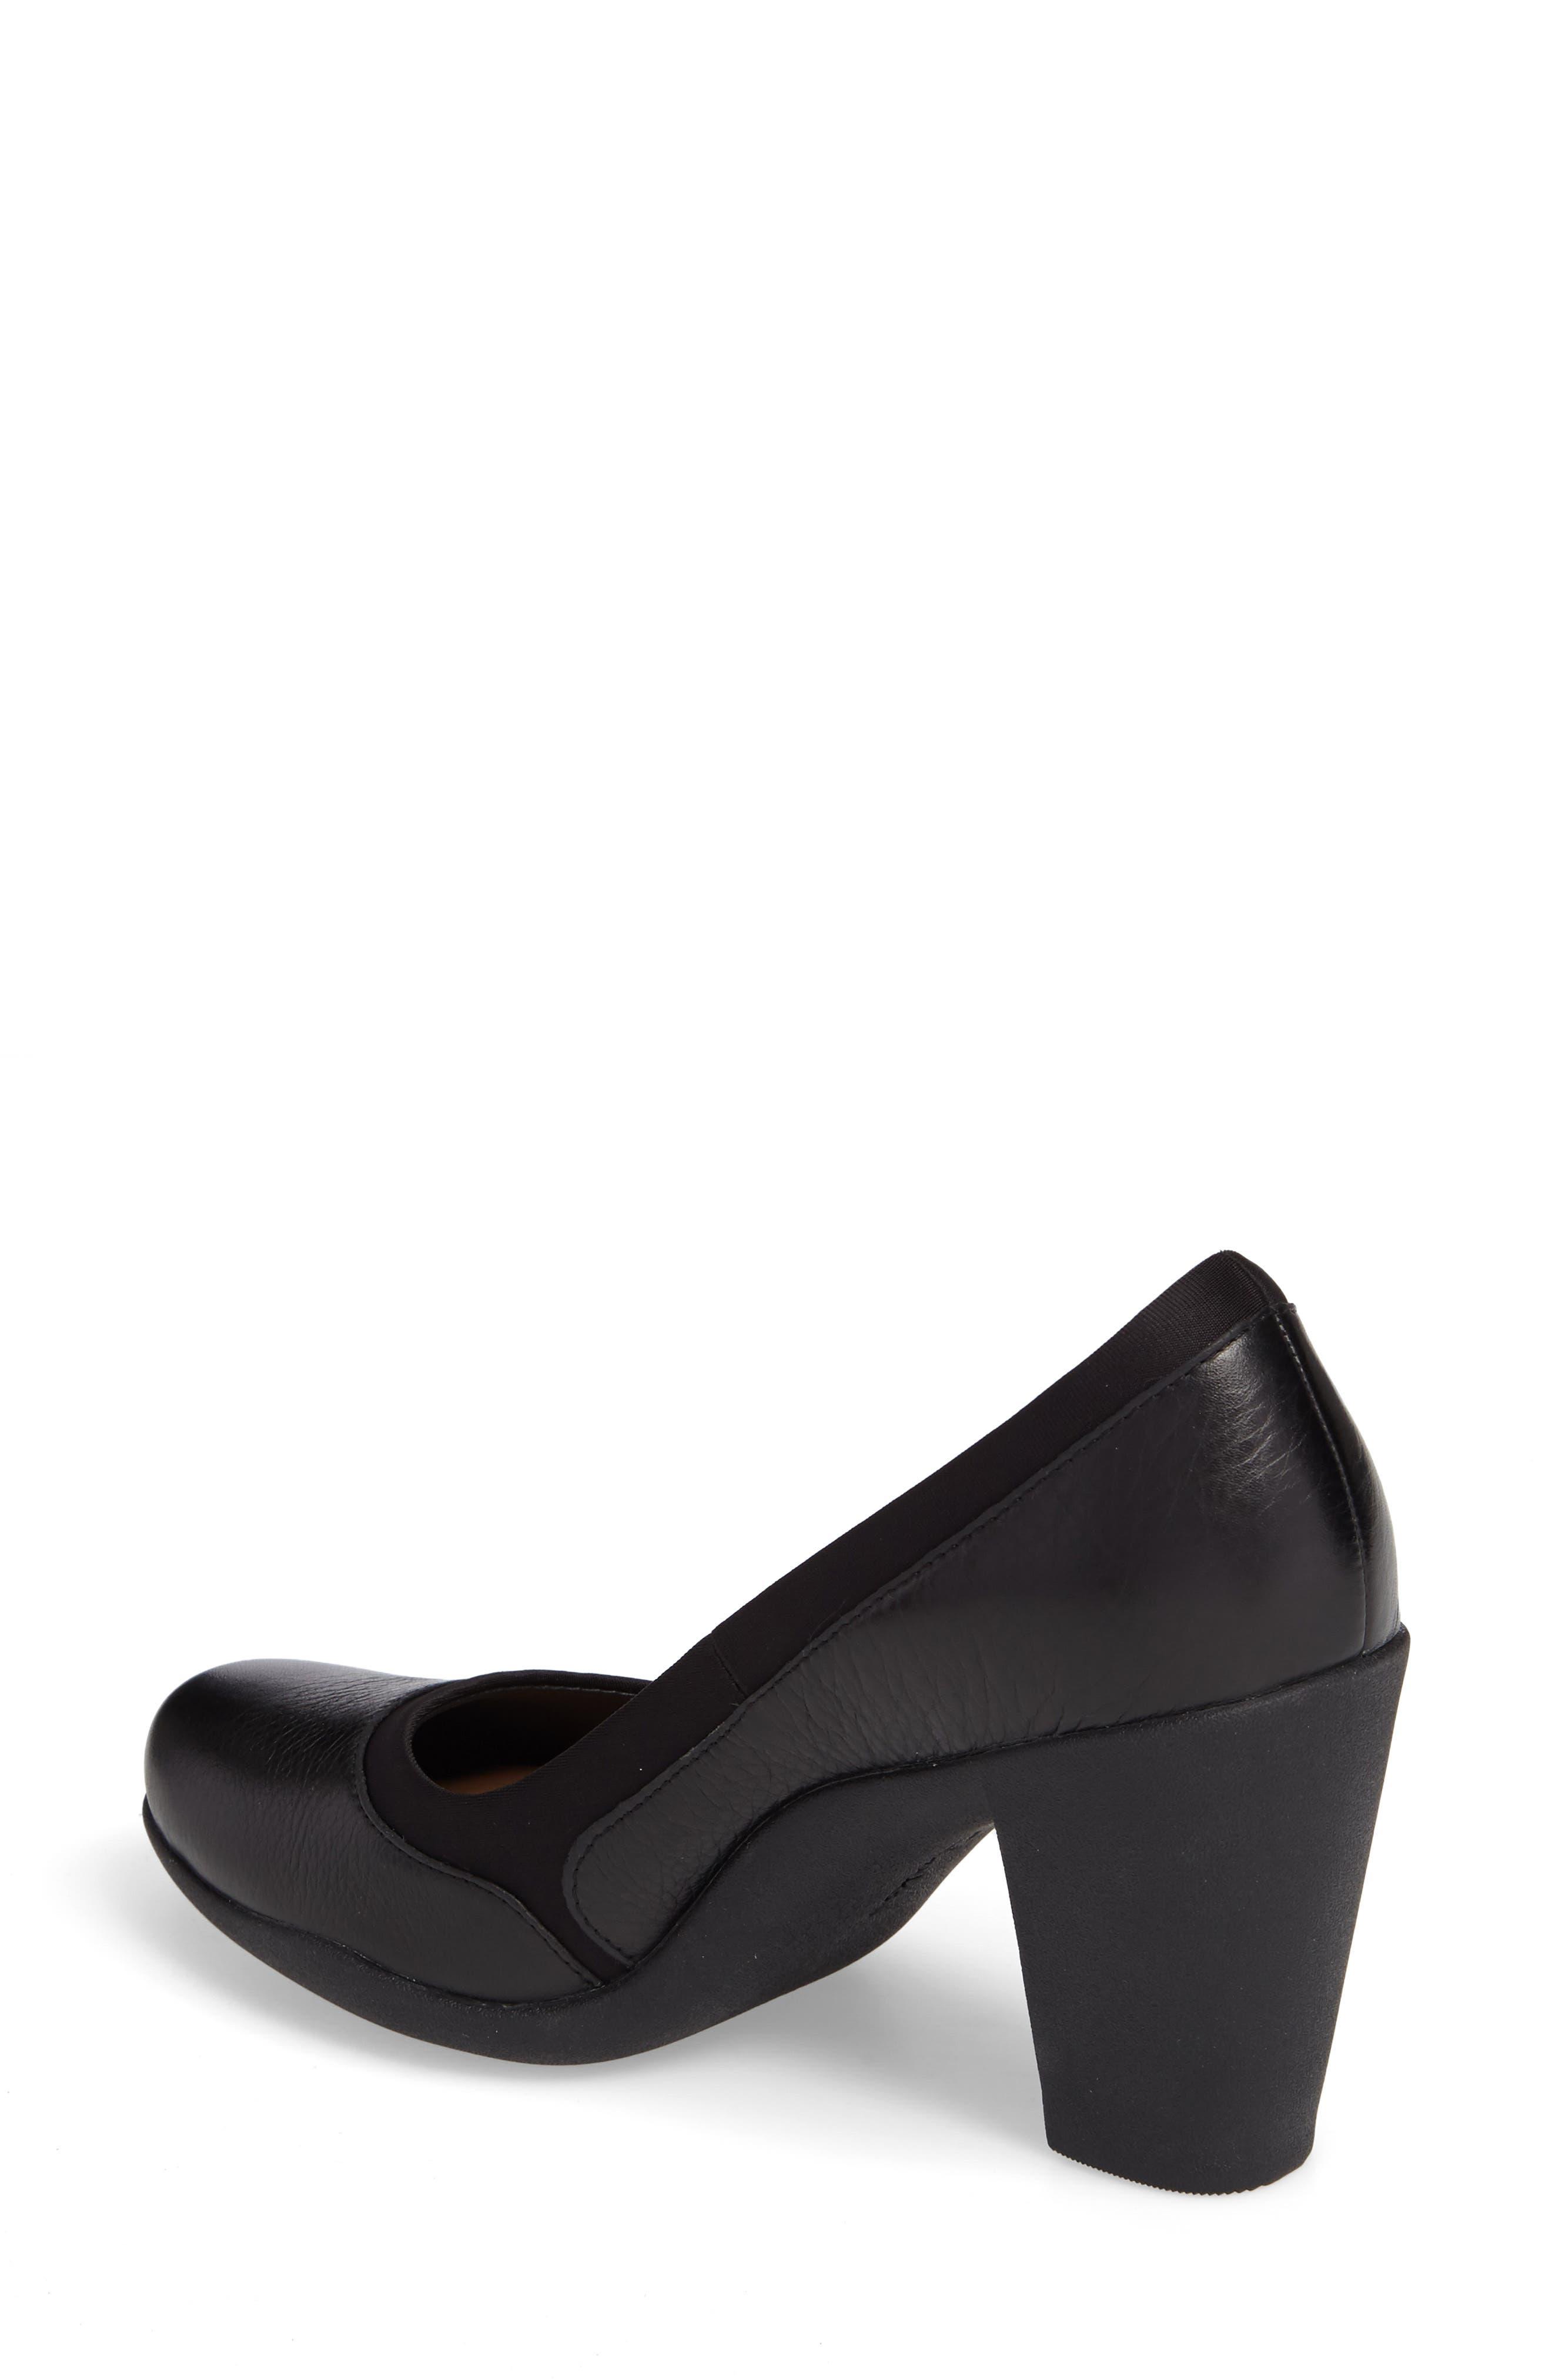 Ayda Maia Pump,                             Alternate thumbnail 2, color,                             Black Leather